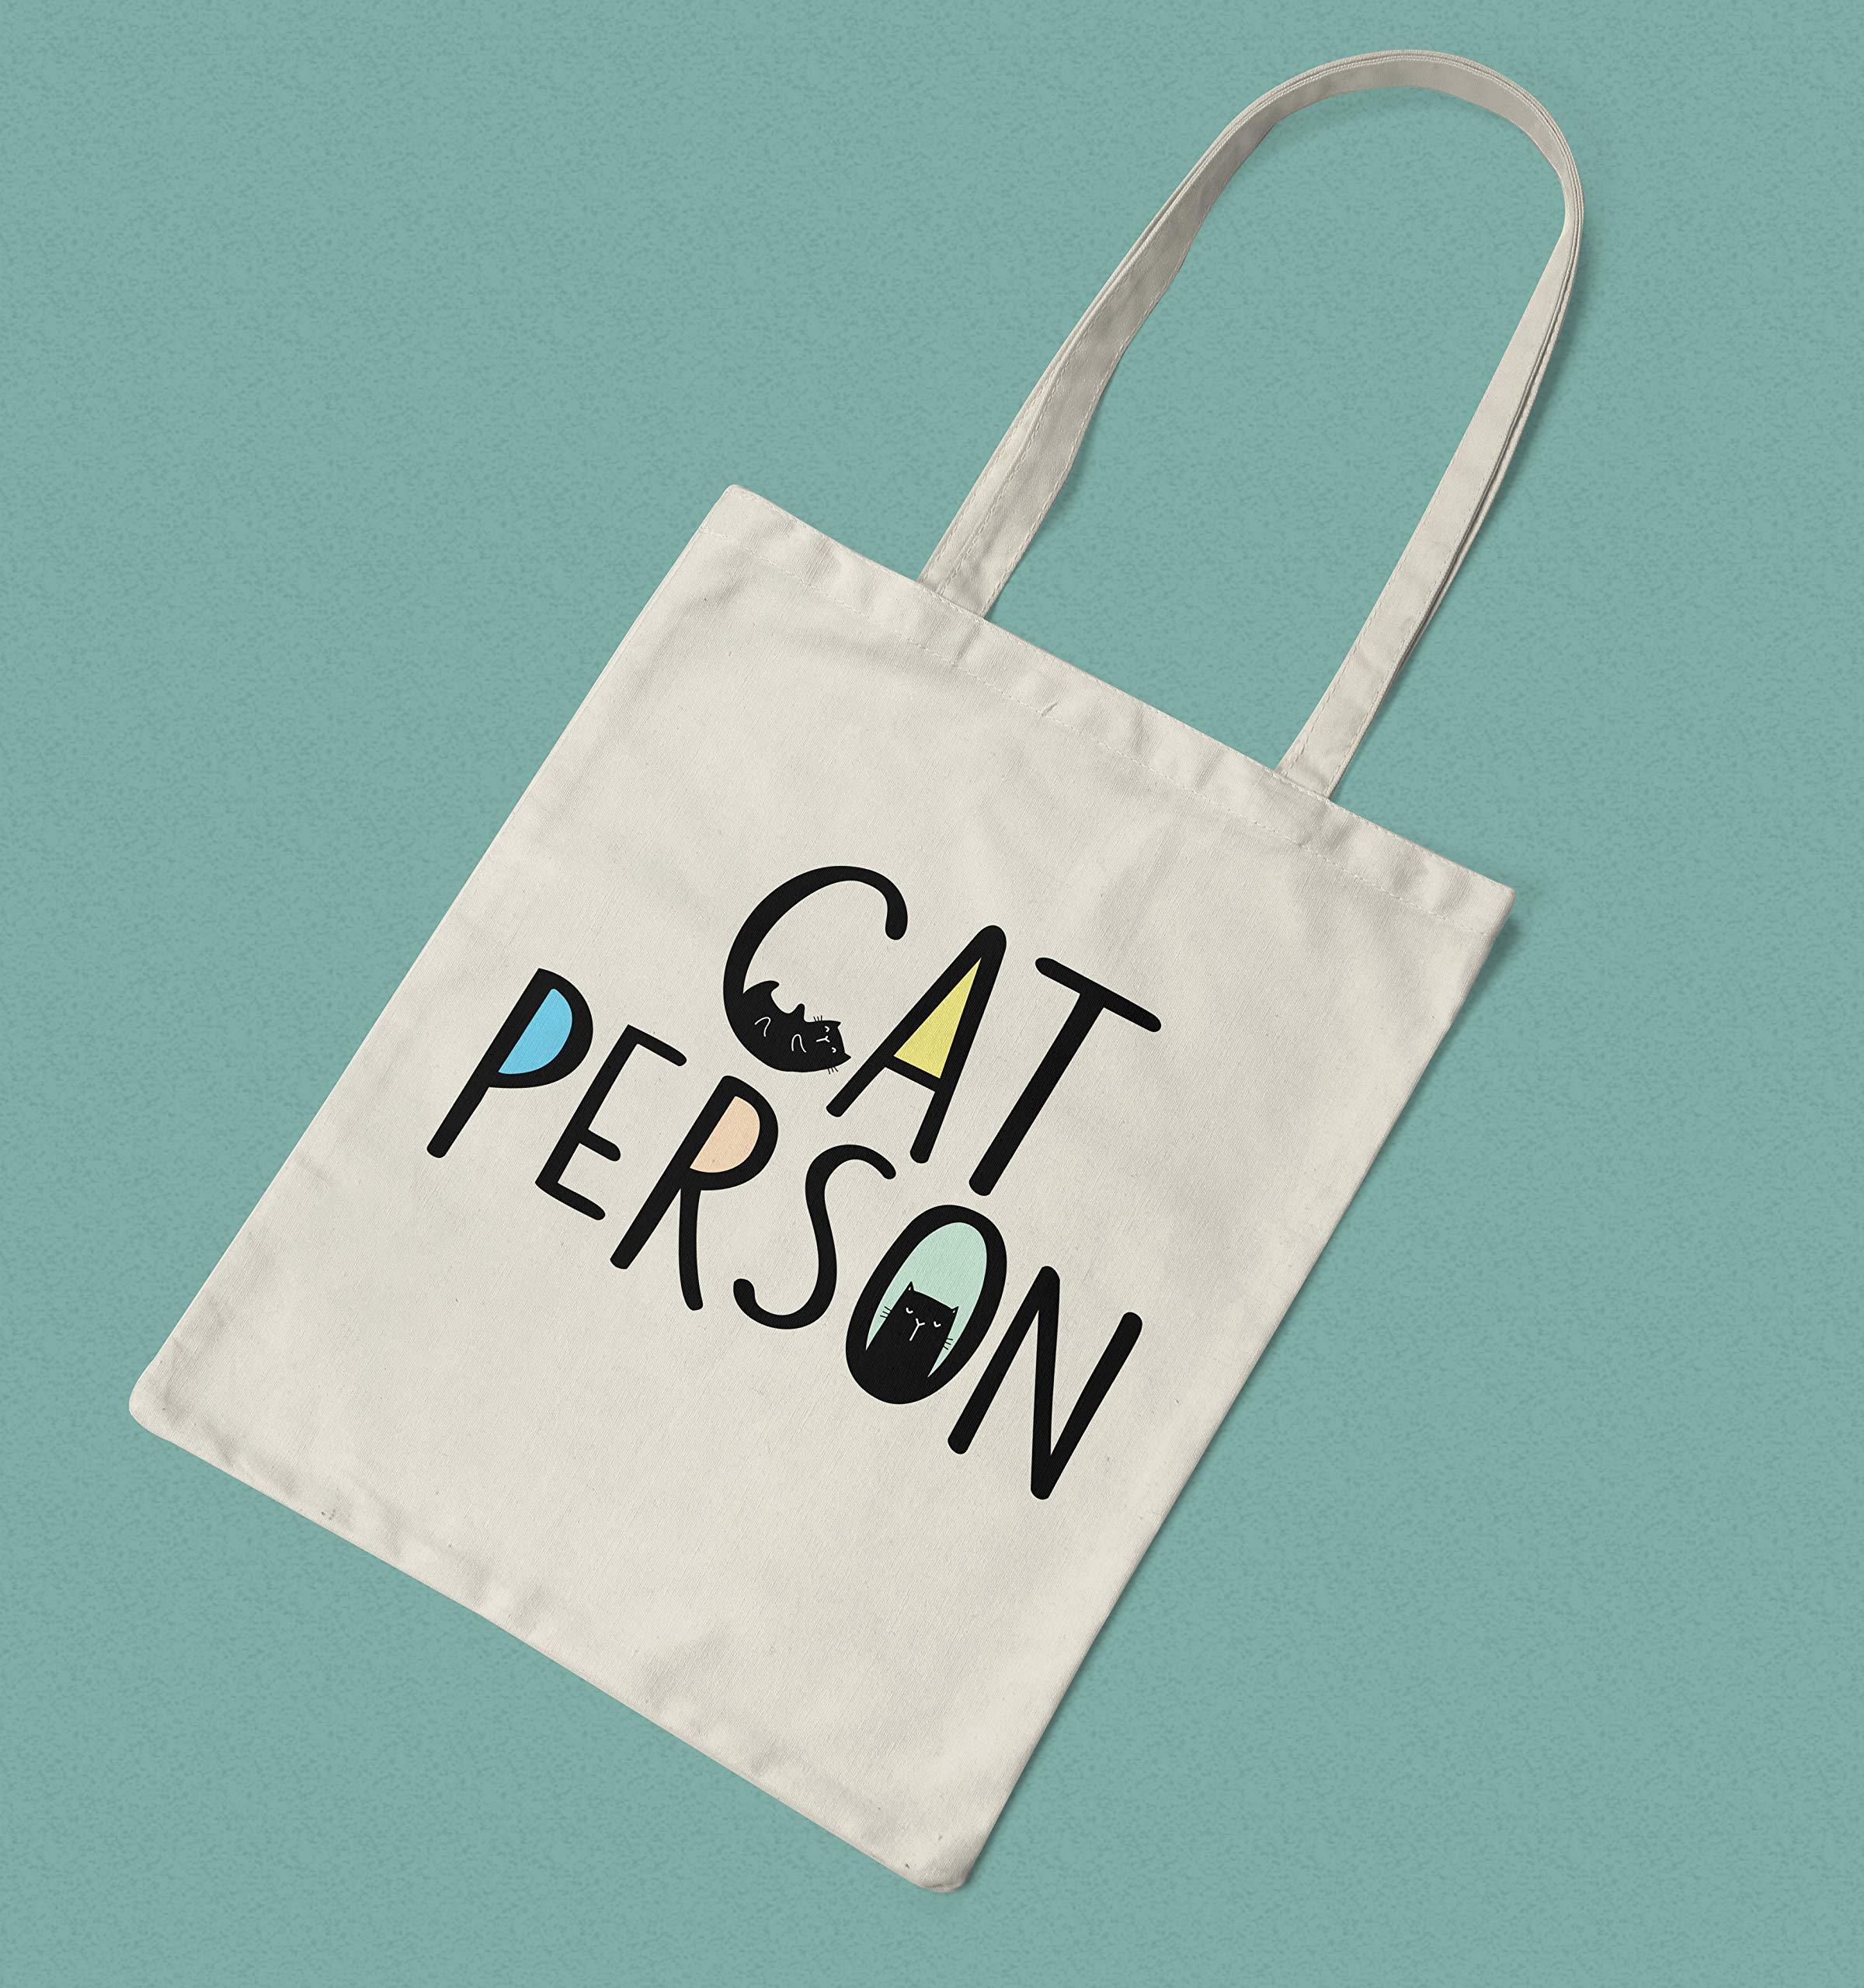 Cat Lover Gift Idea Cat Person Printed Tote Bag - handmade-bags